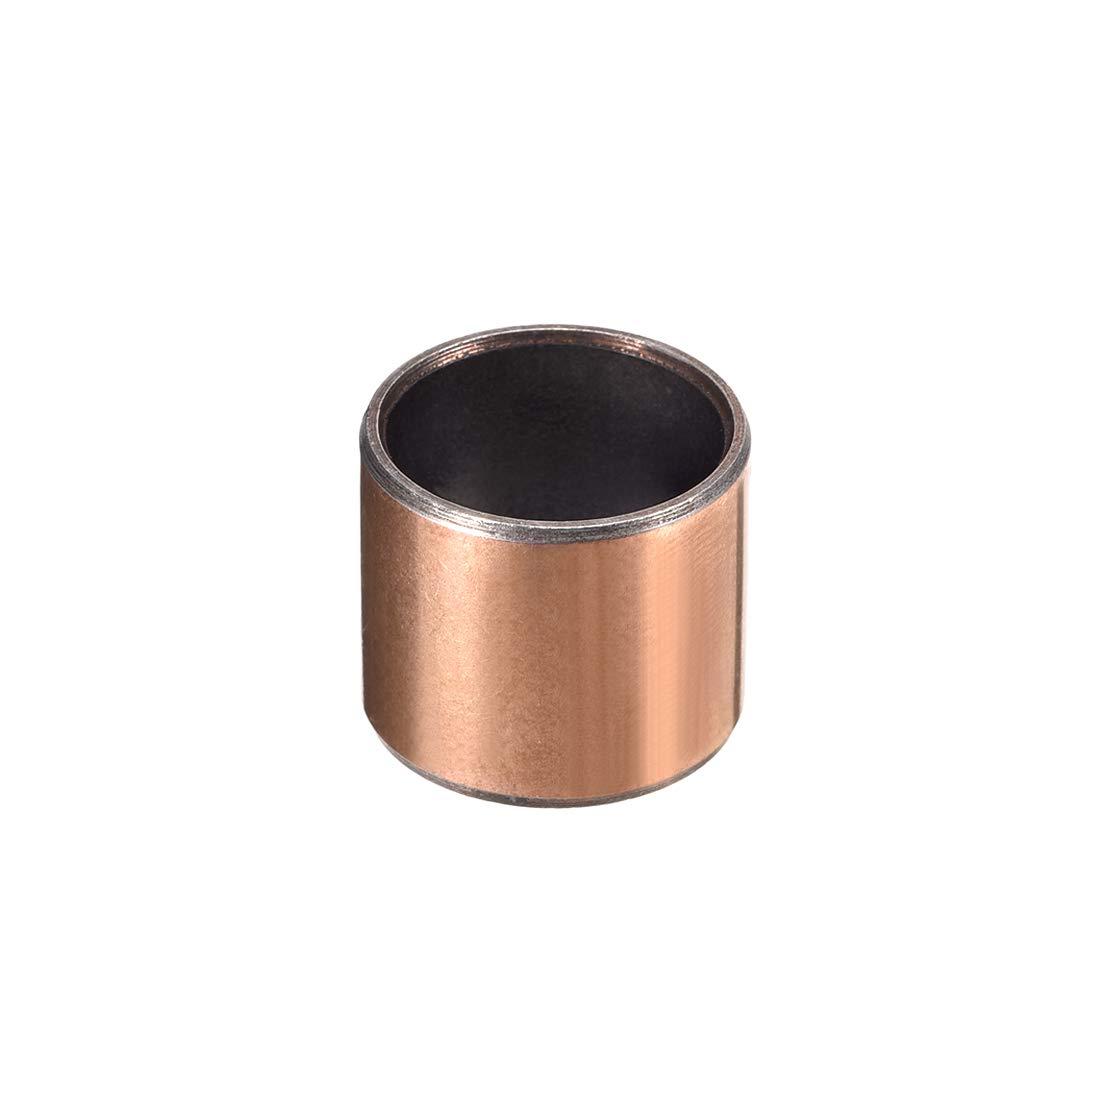 uxcell/® Sleeve Bearing 3//4 Bore x 7//8 OD x 3//4 Length Plain Bearings Wrapped Oilless Bushings